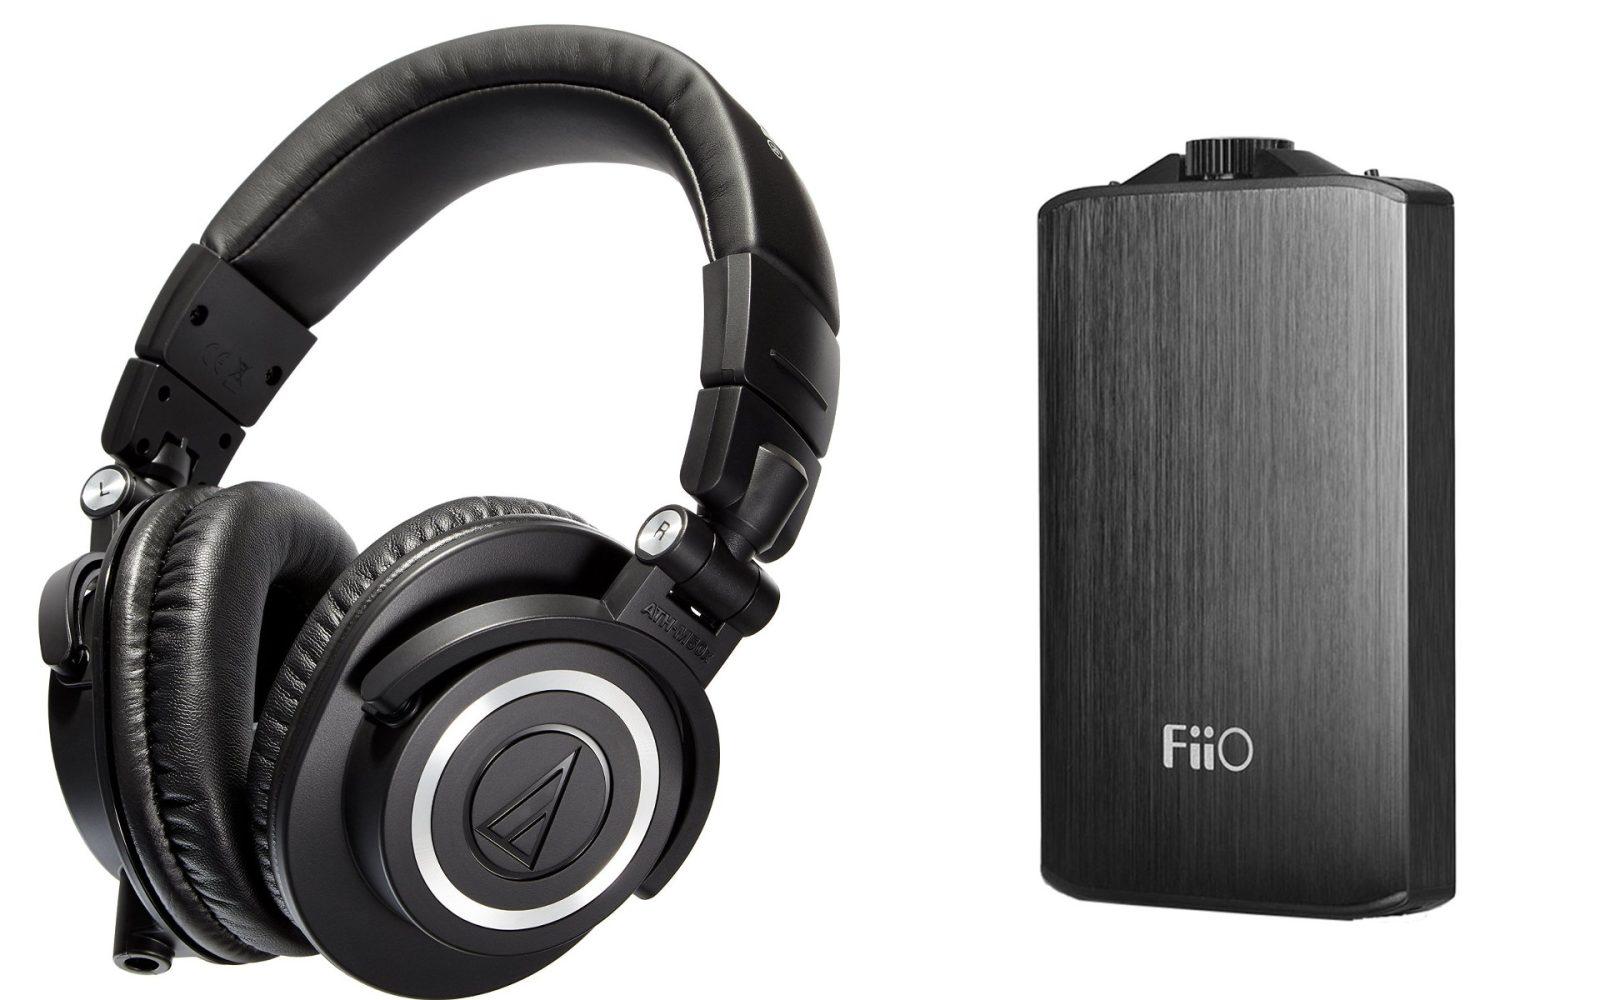 5c33c105b33 Audio-Technica's best selling ATH-M50x studio headphones + FiiO A3 amp $130  shipped ($180+ value)